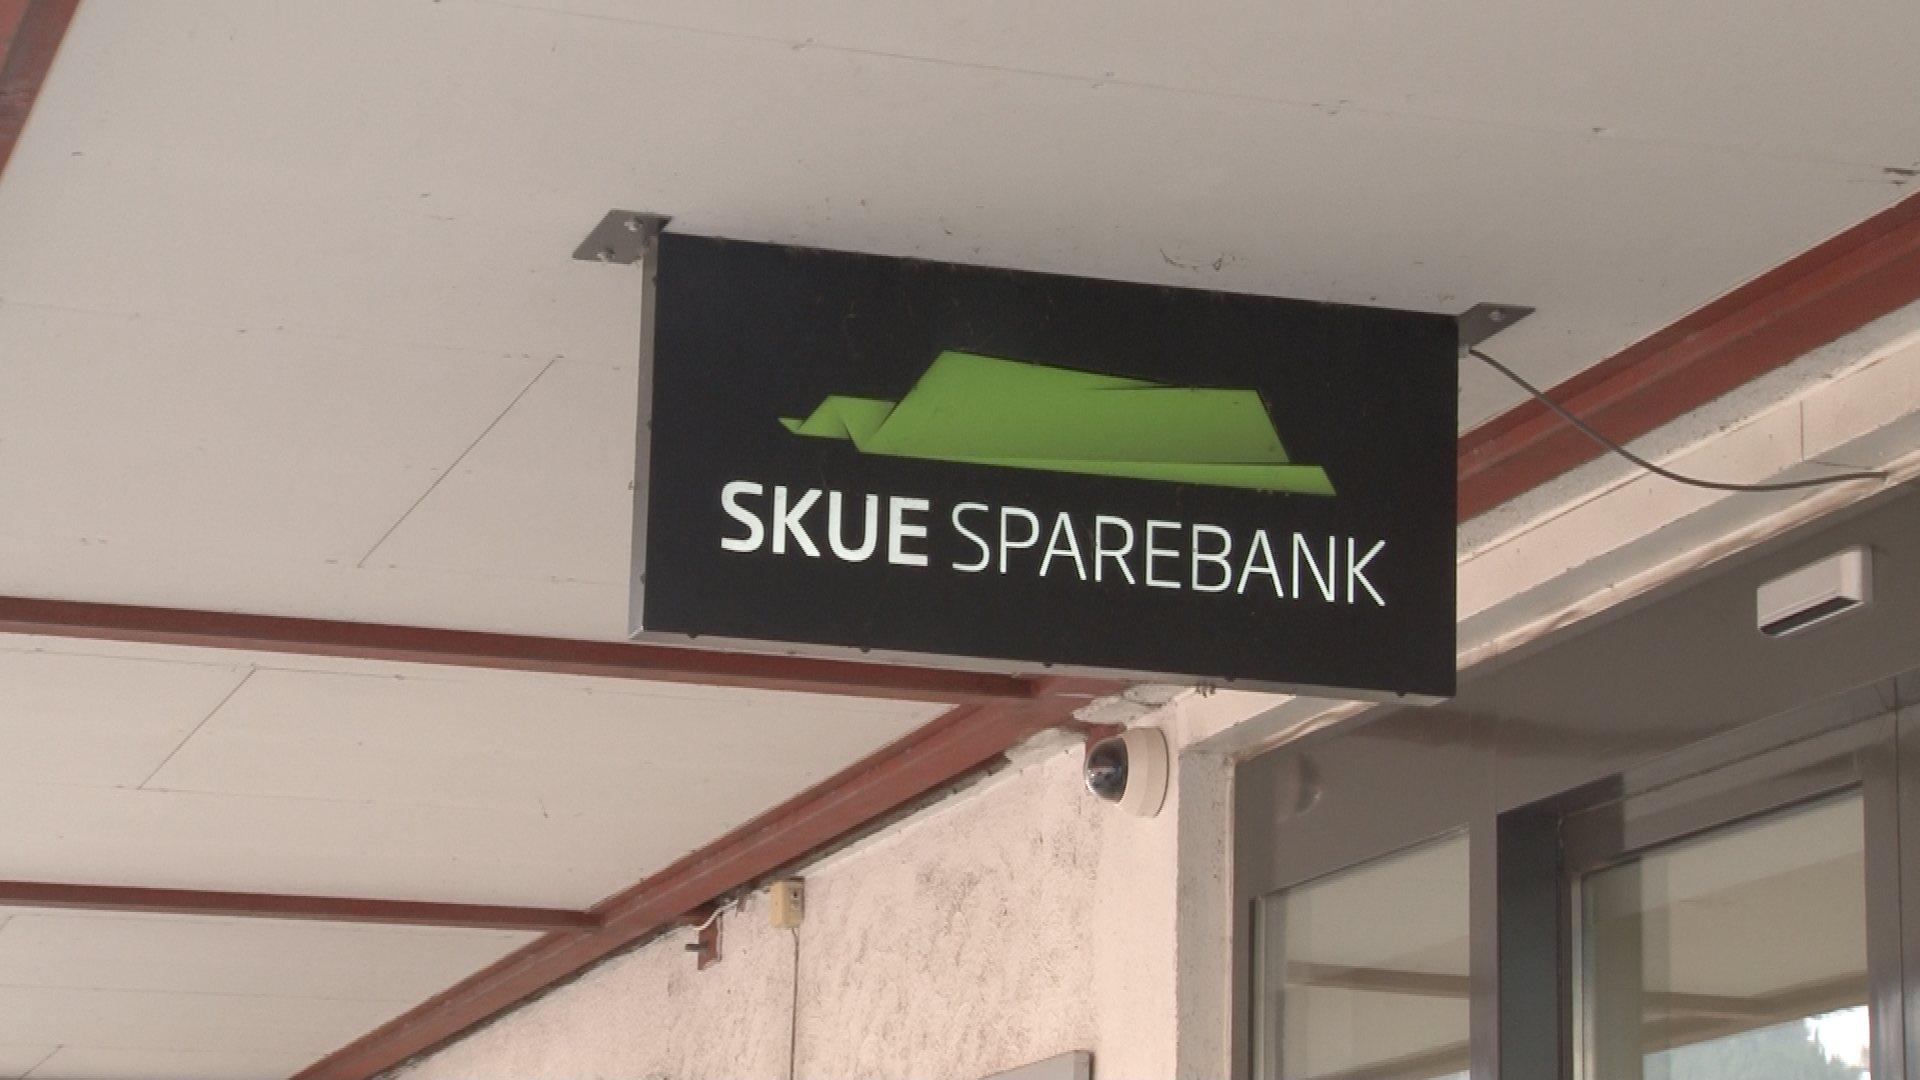 Solid resultat for Skue sparebank